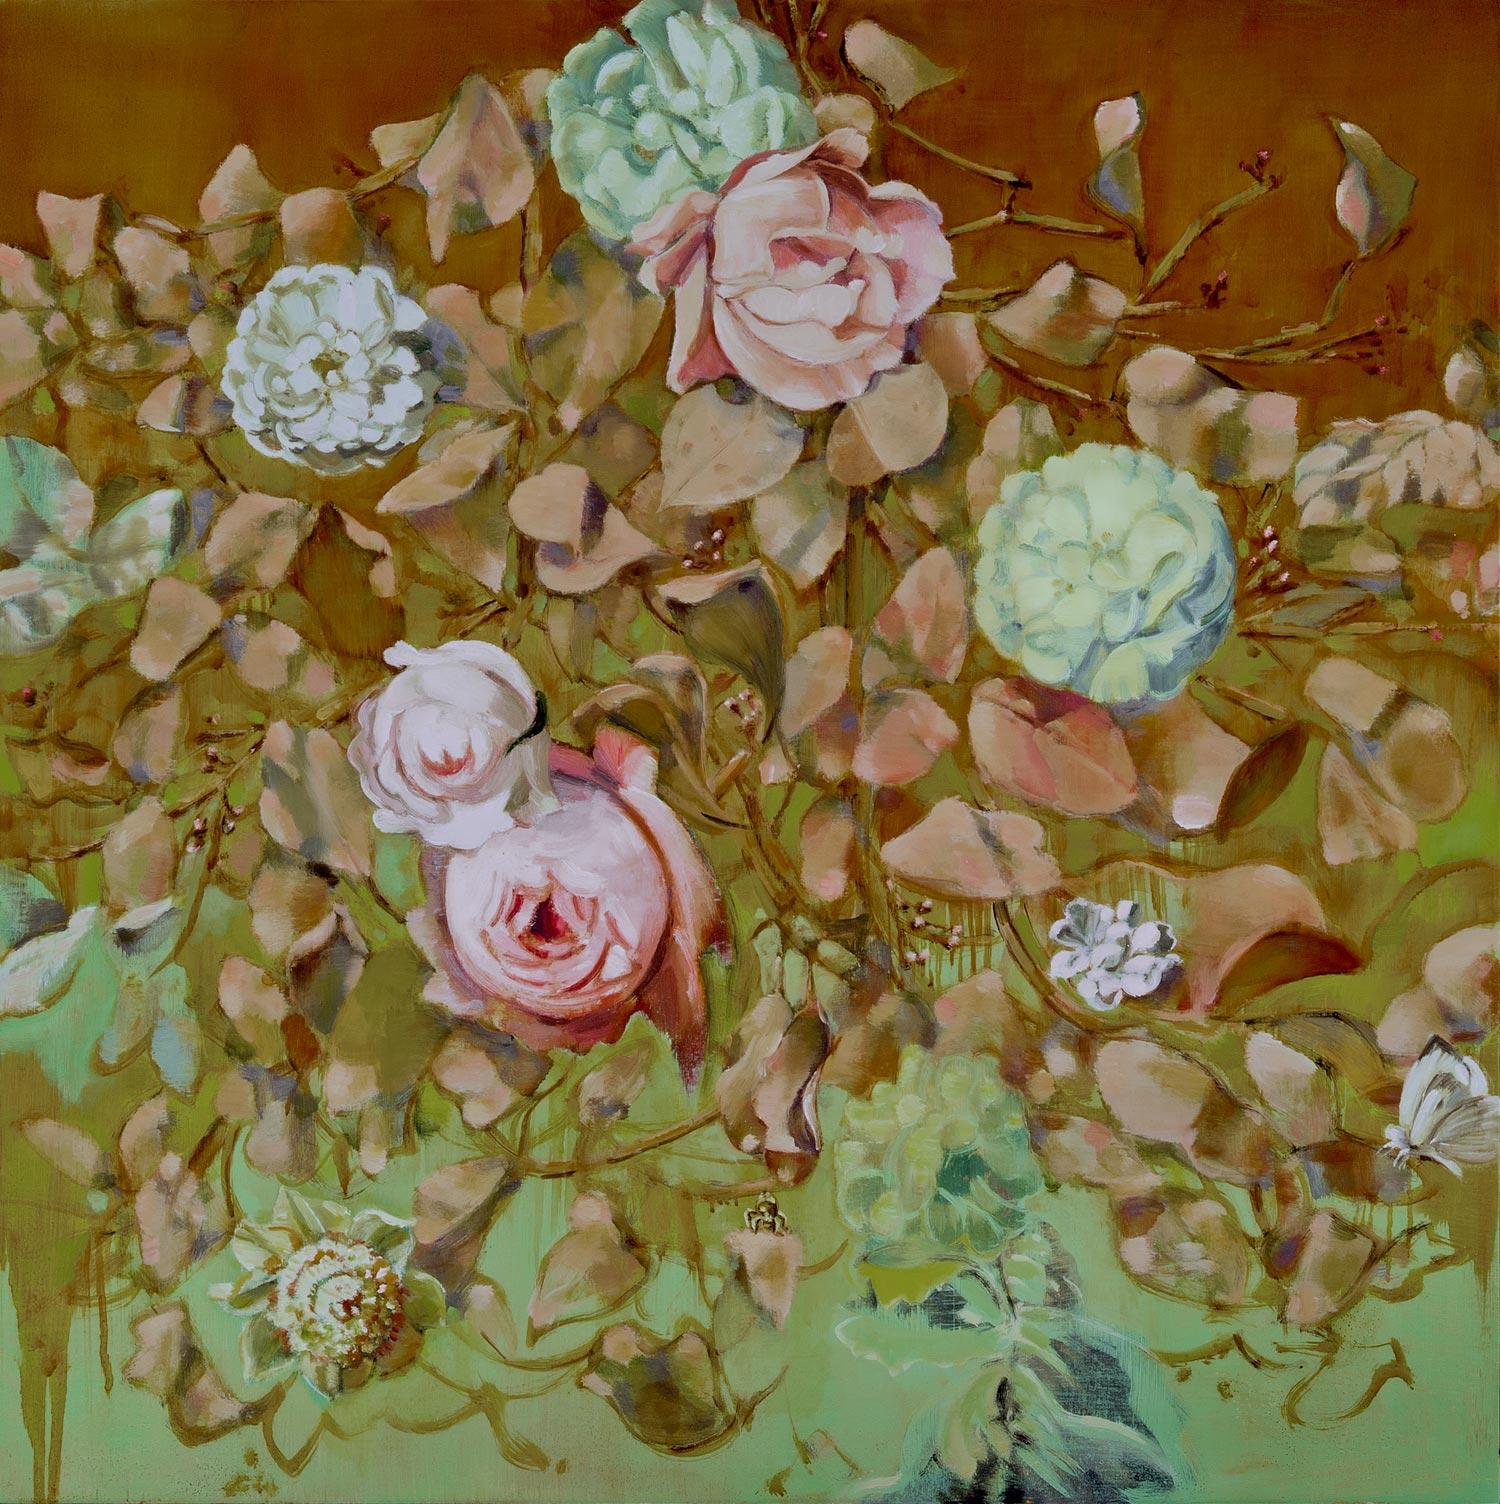 "RESTORATION  oil on panel  30 x 30"" 2011"